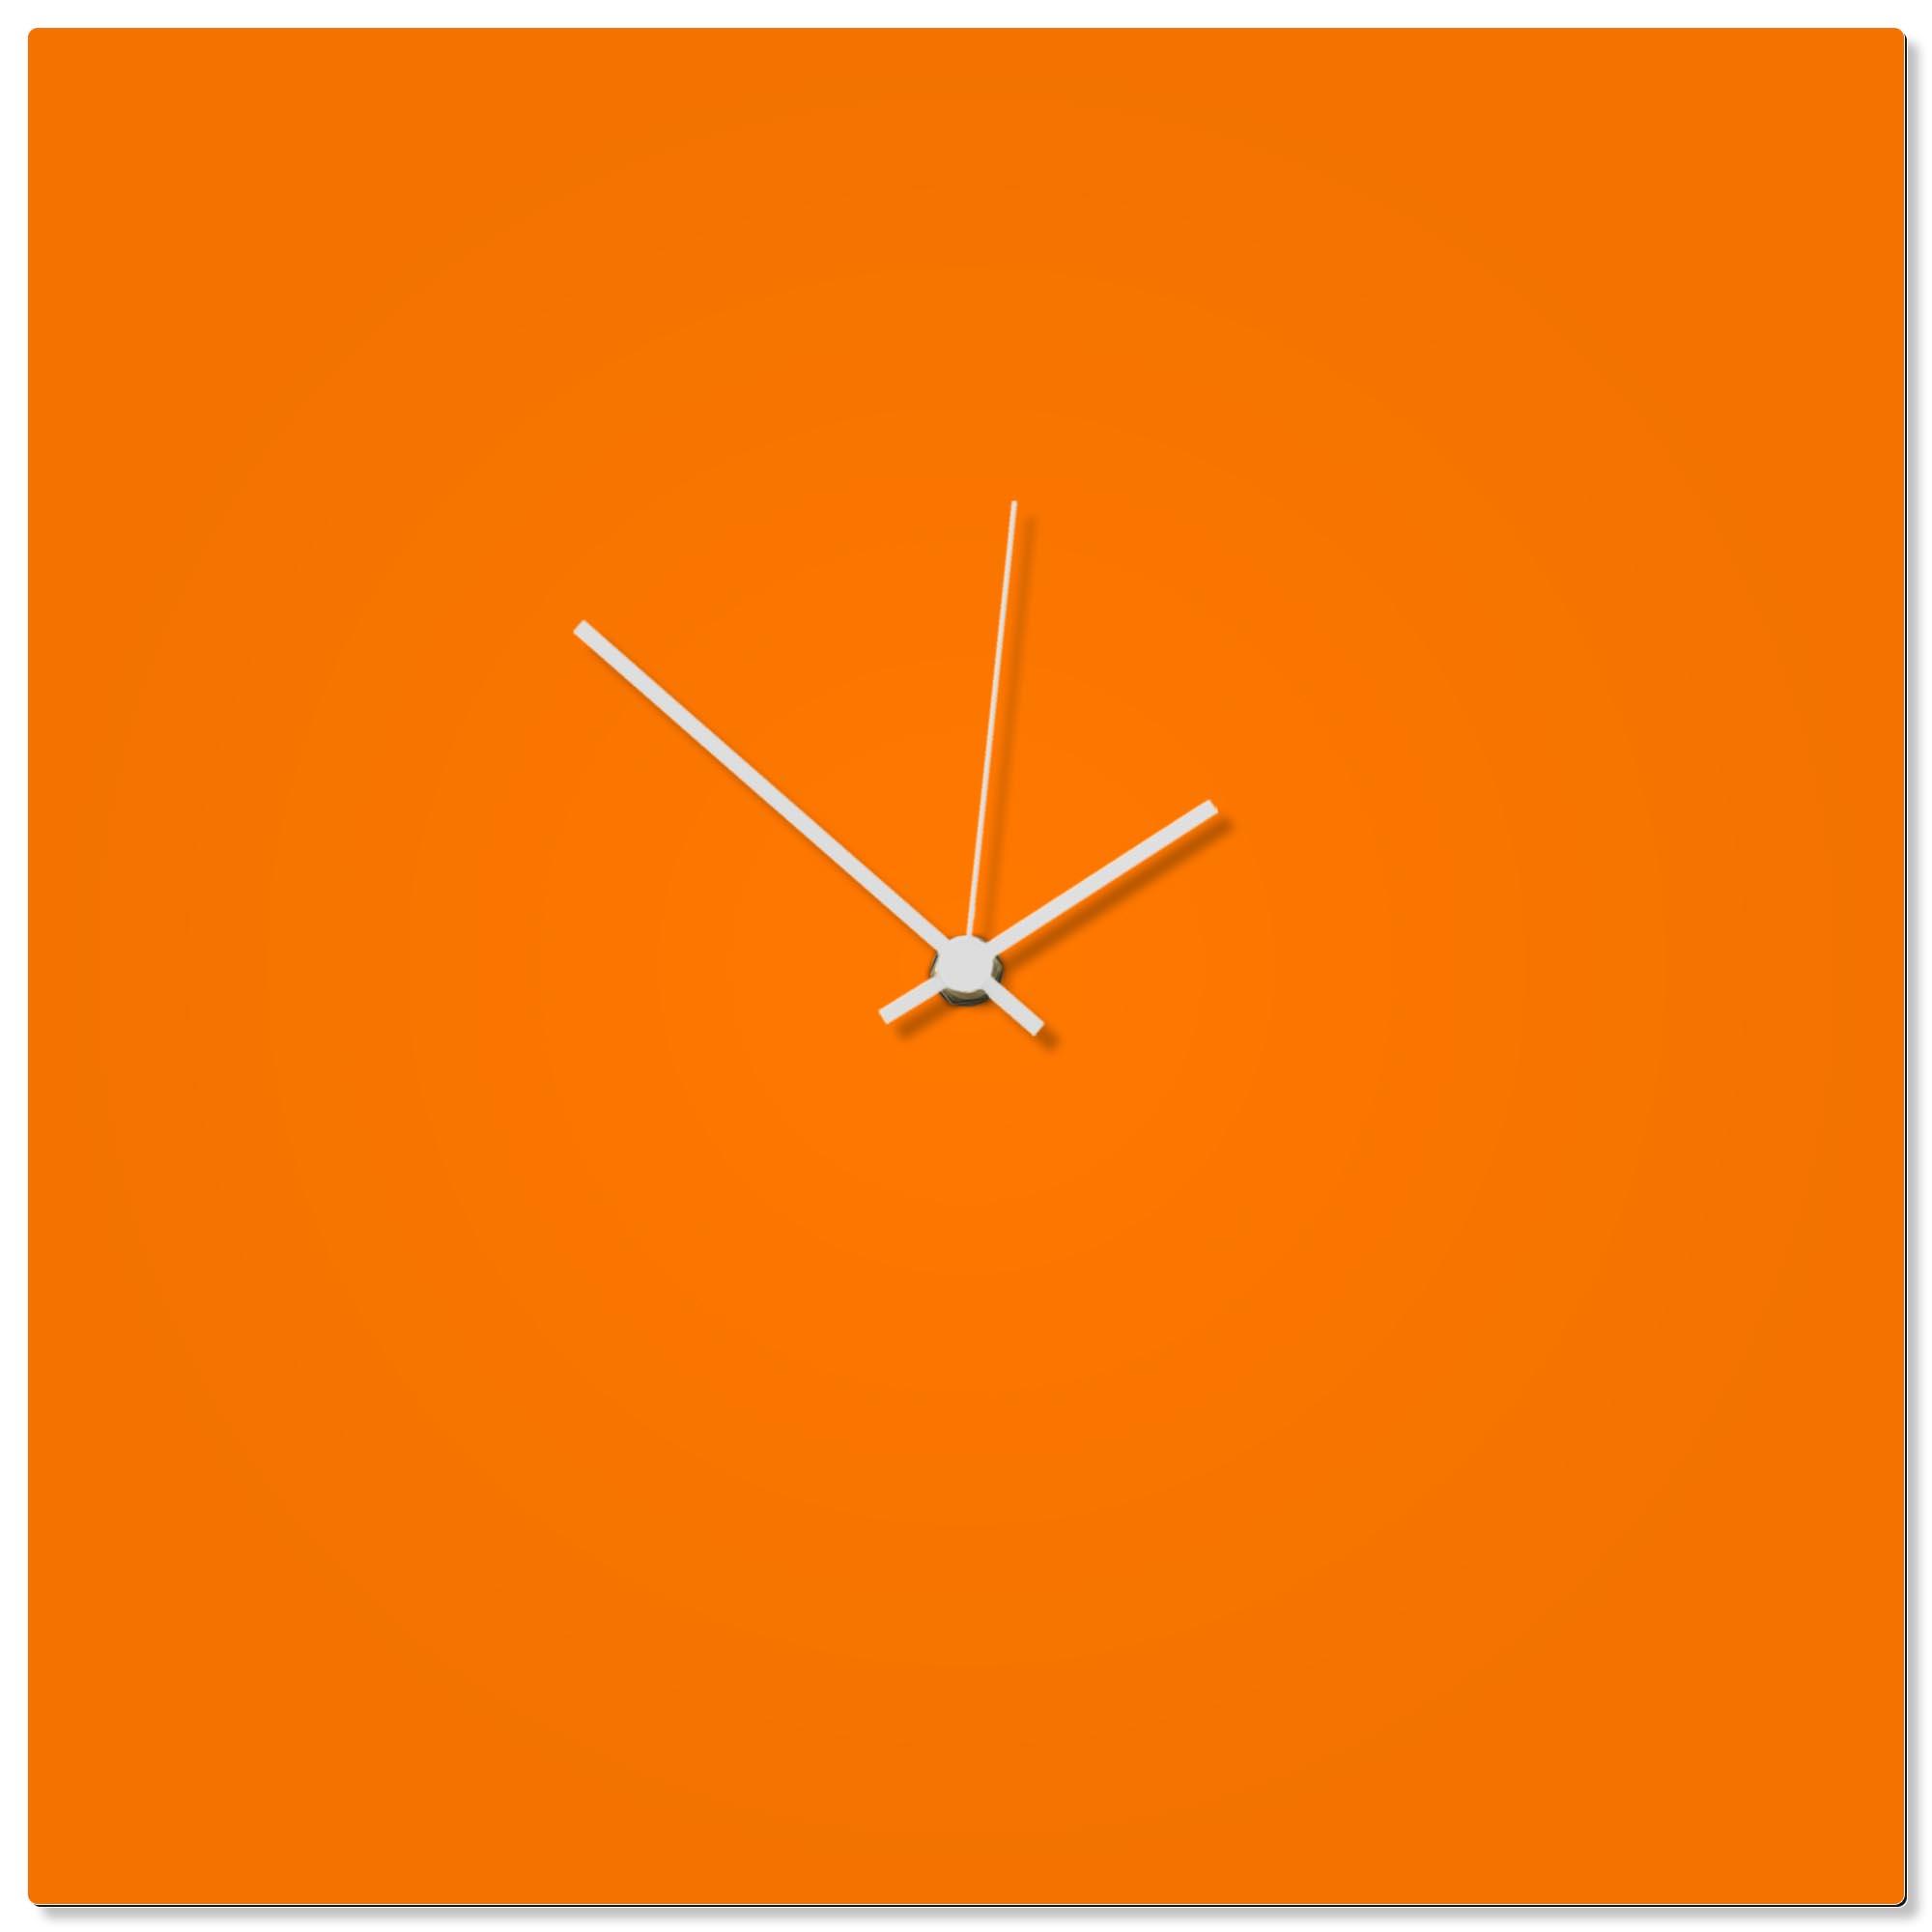 Orangeout White Square Clock 16x16in. Aluminum Polymetal